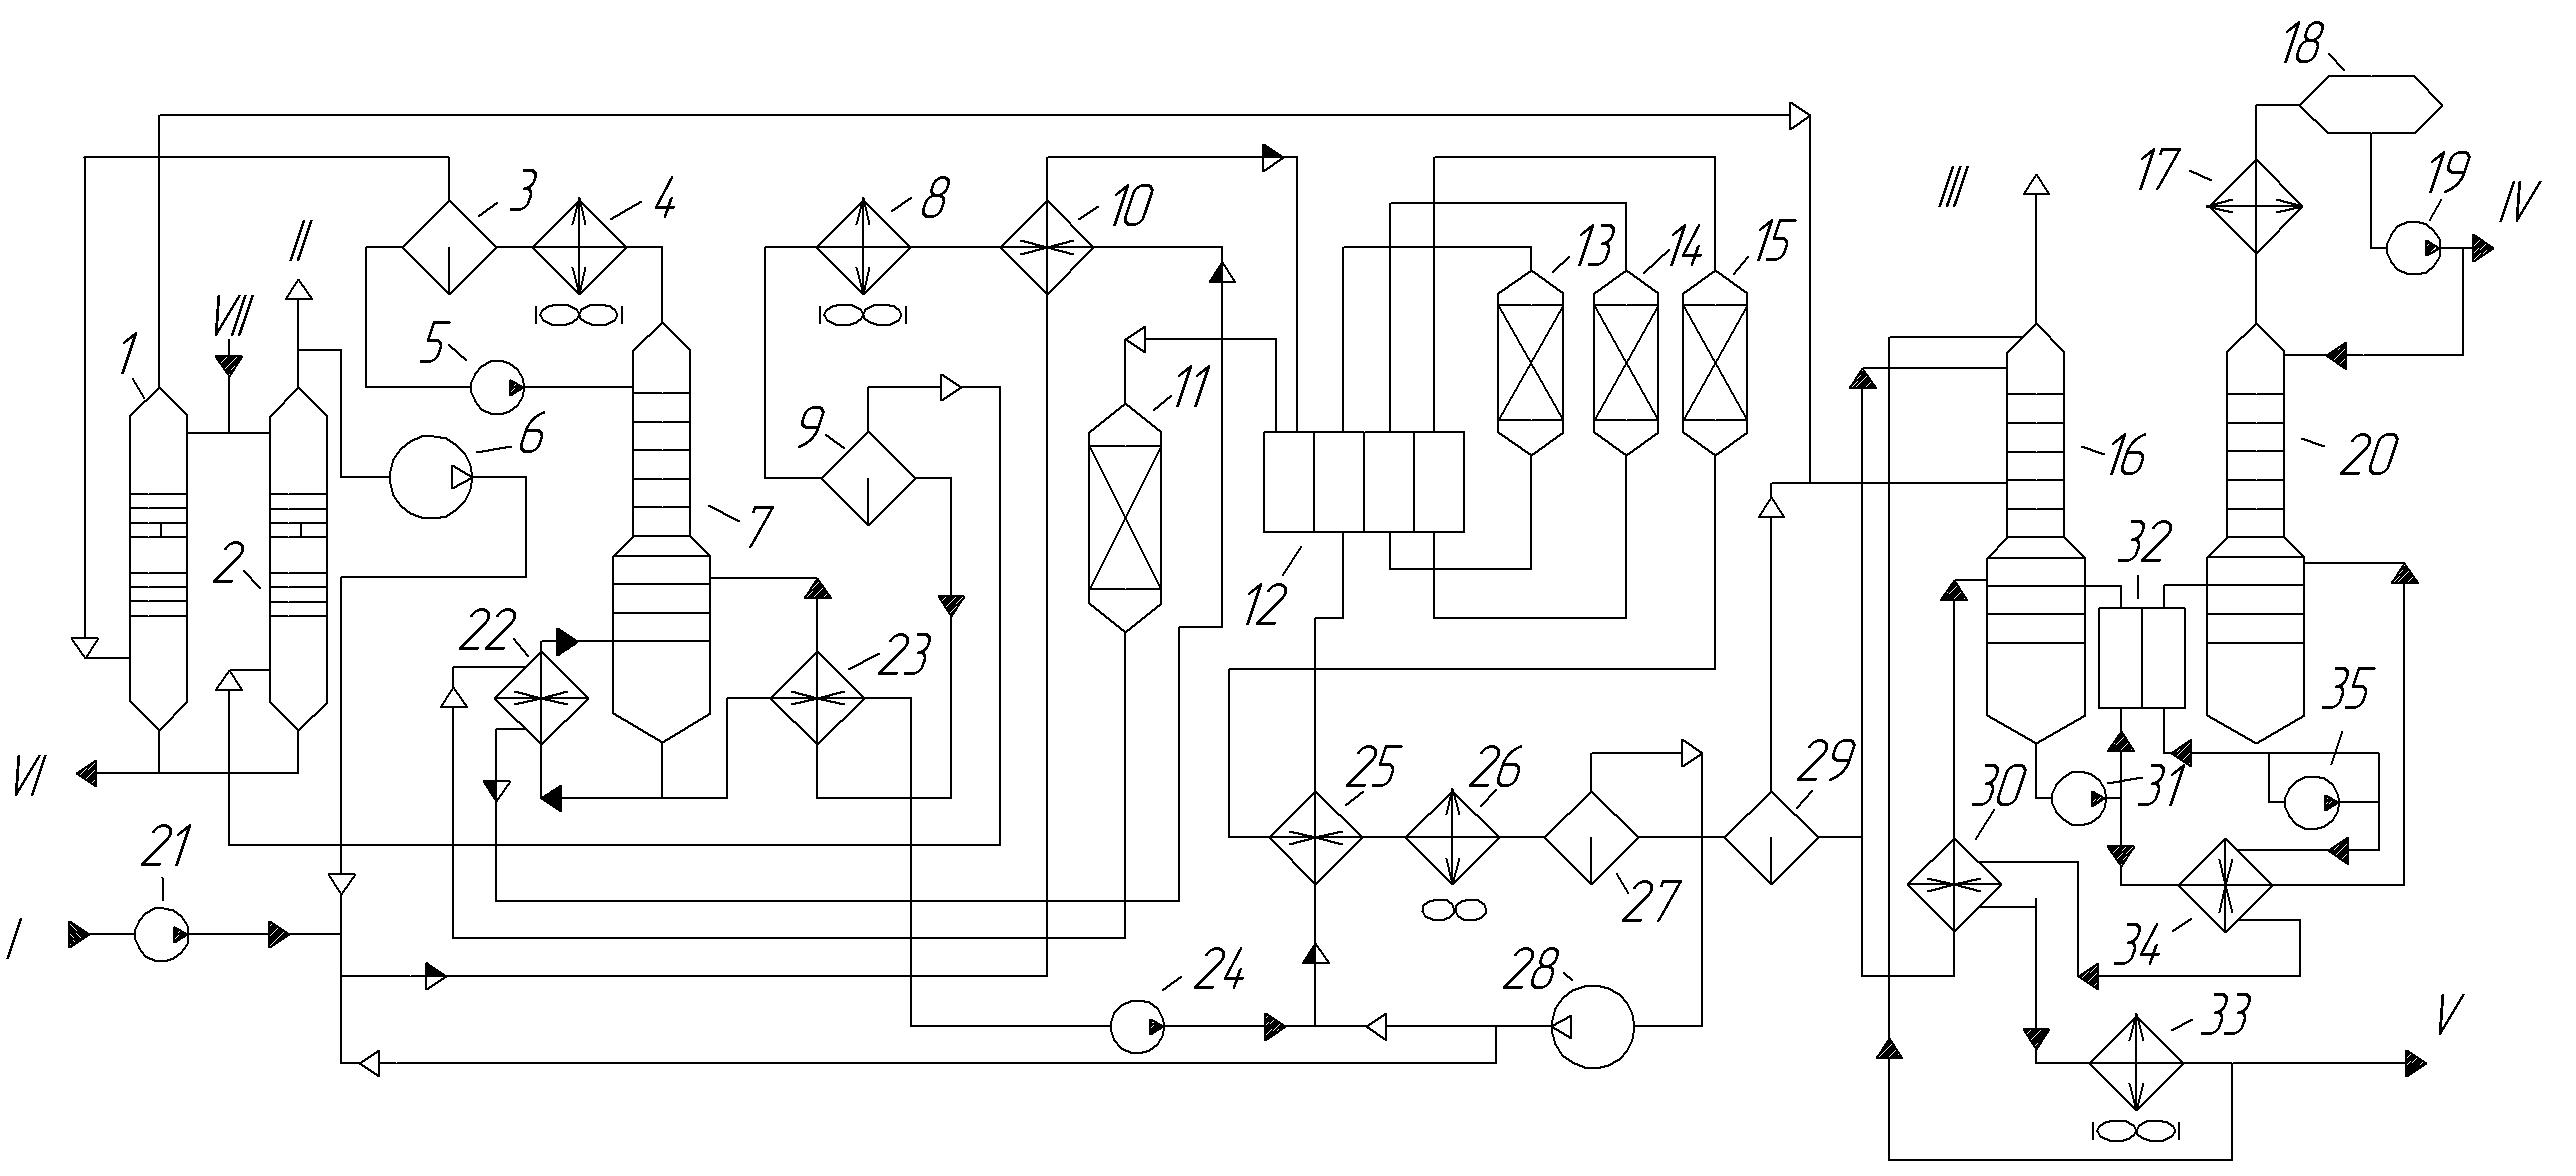 схема установки каталитического риформинга